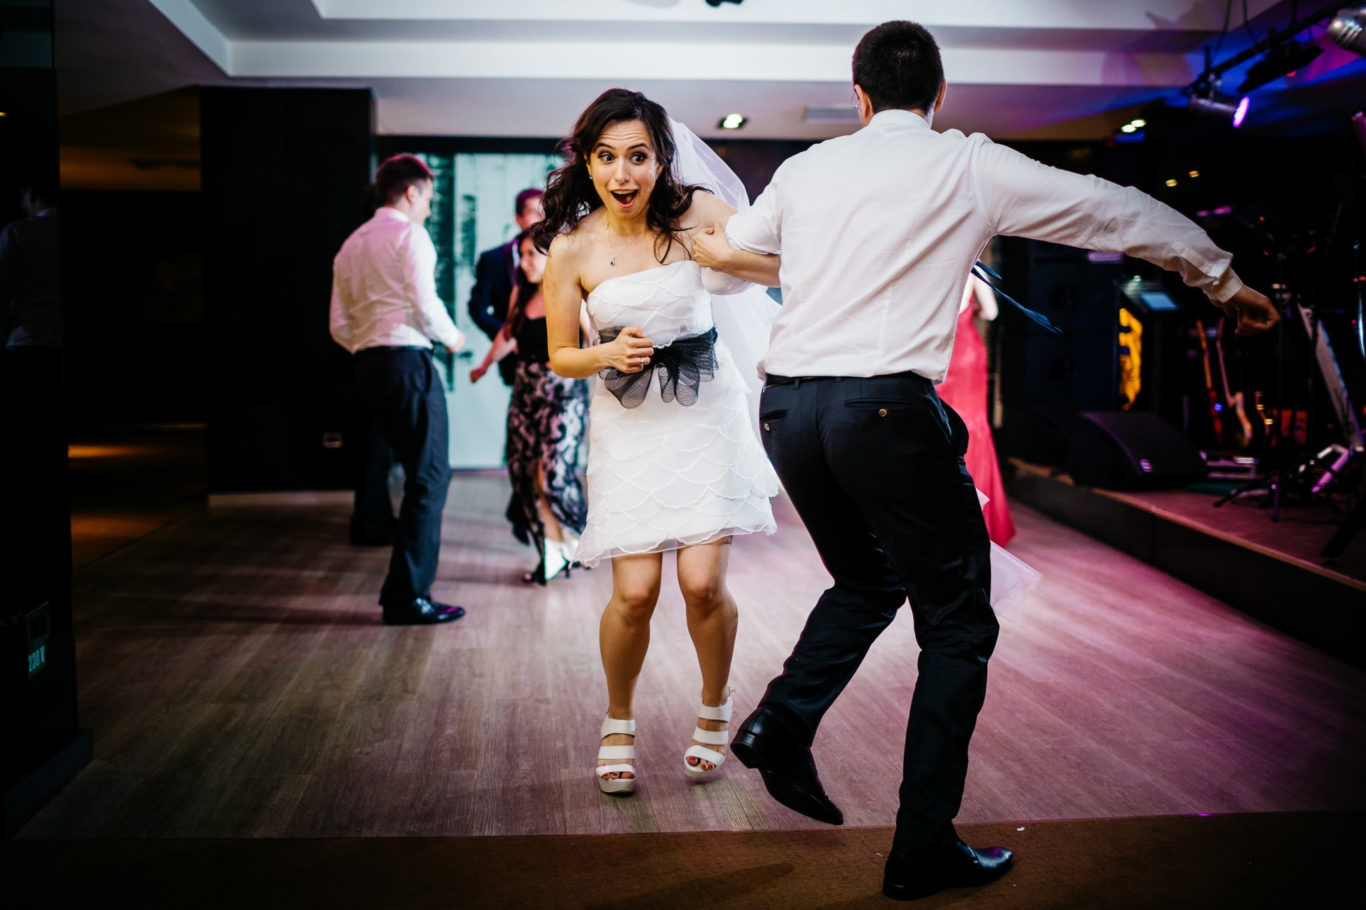 1057-Fotografie-nunta-Simona-Valentin-fotograf-Ciprian-Dumitrescu-CDF_0524